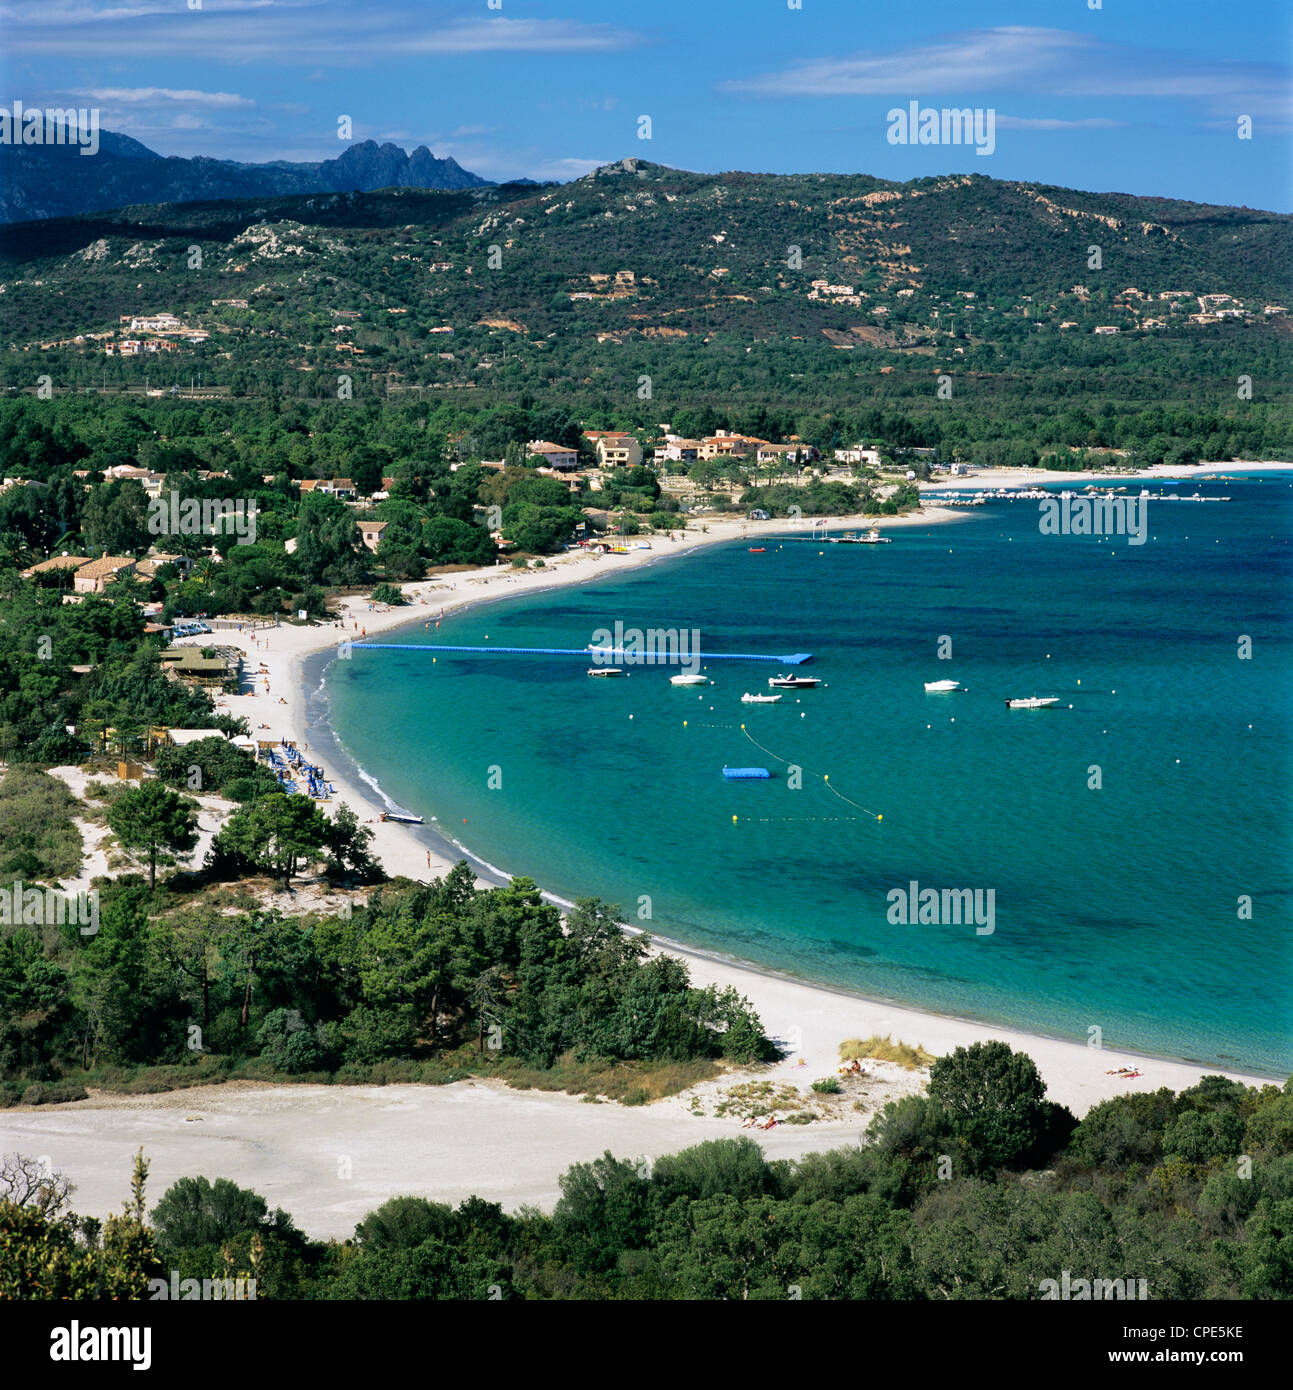 san ciprianu beach near porto vecchio south east corsica corsica stock photo 48254962 alamy. Black Bedroom Furniture Sets. Home Design Ideas